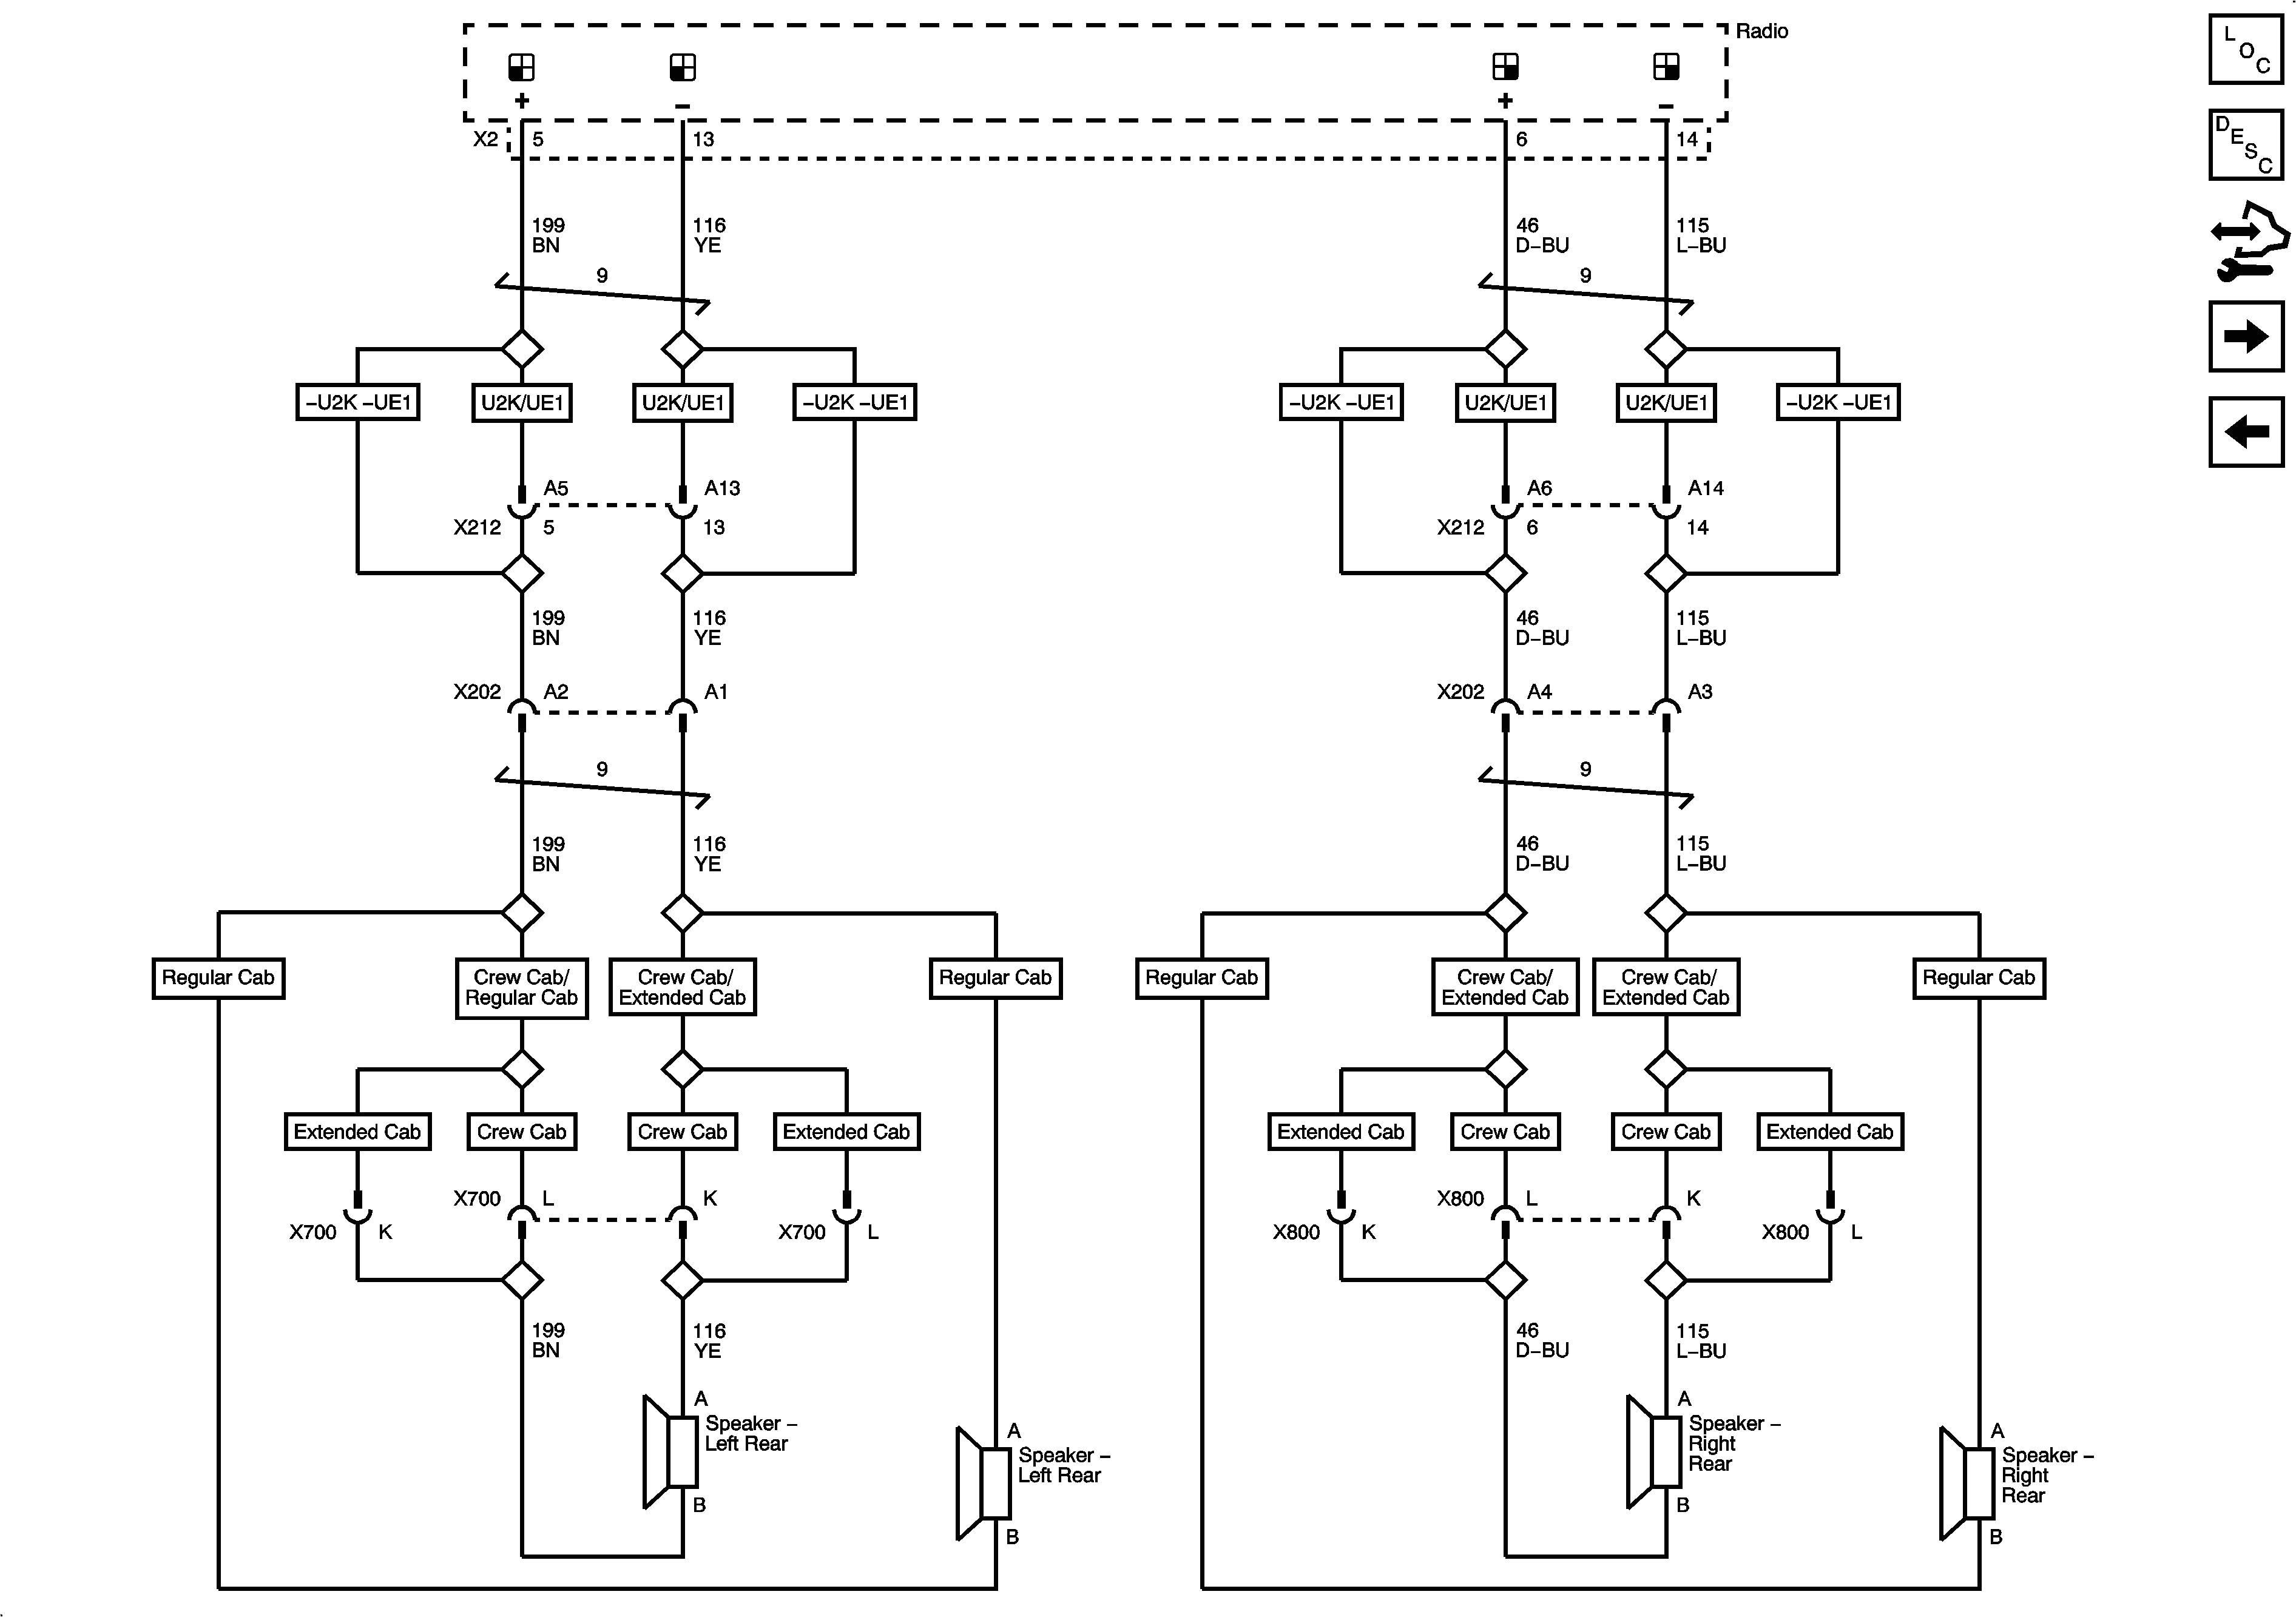 chevy silverado wiring diagram fresh 2006 ford expedition wiring diagram 0d wiring diagram